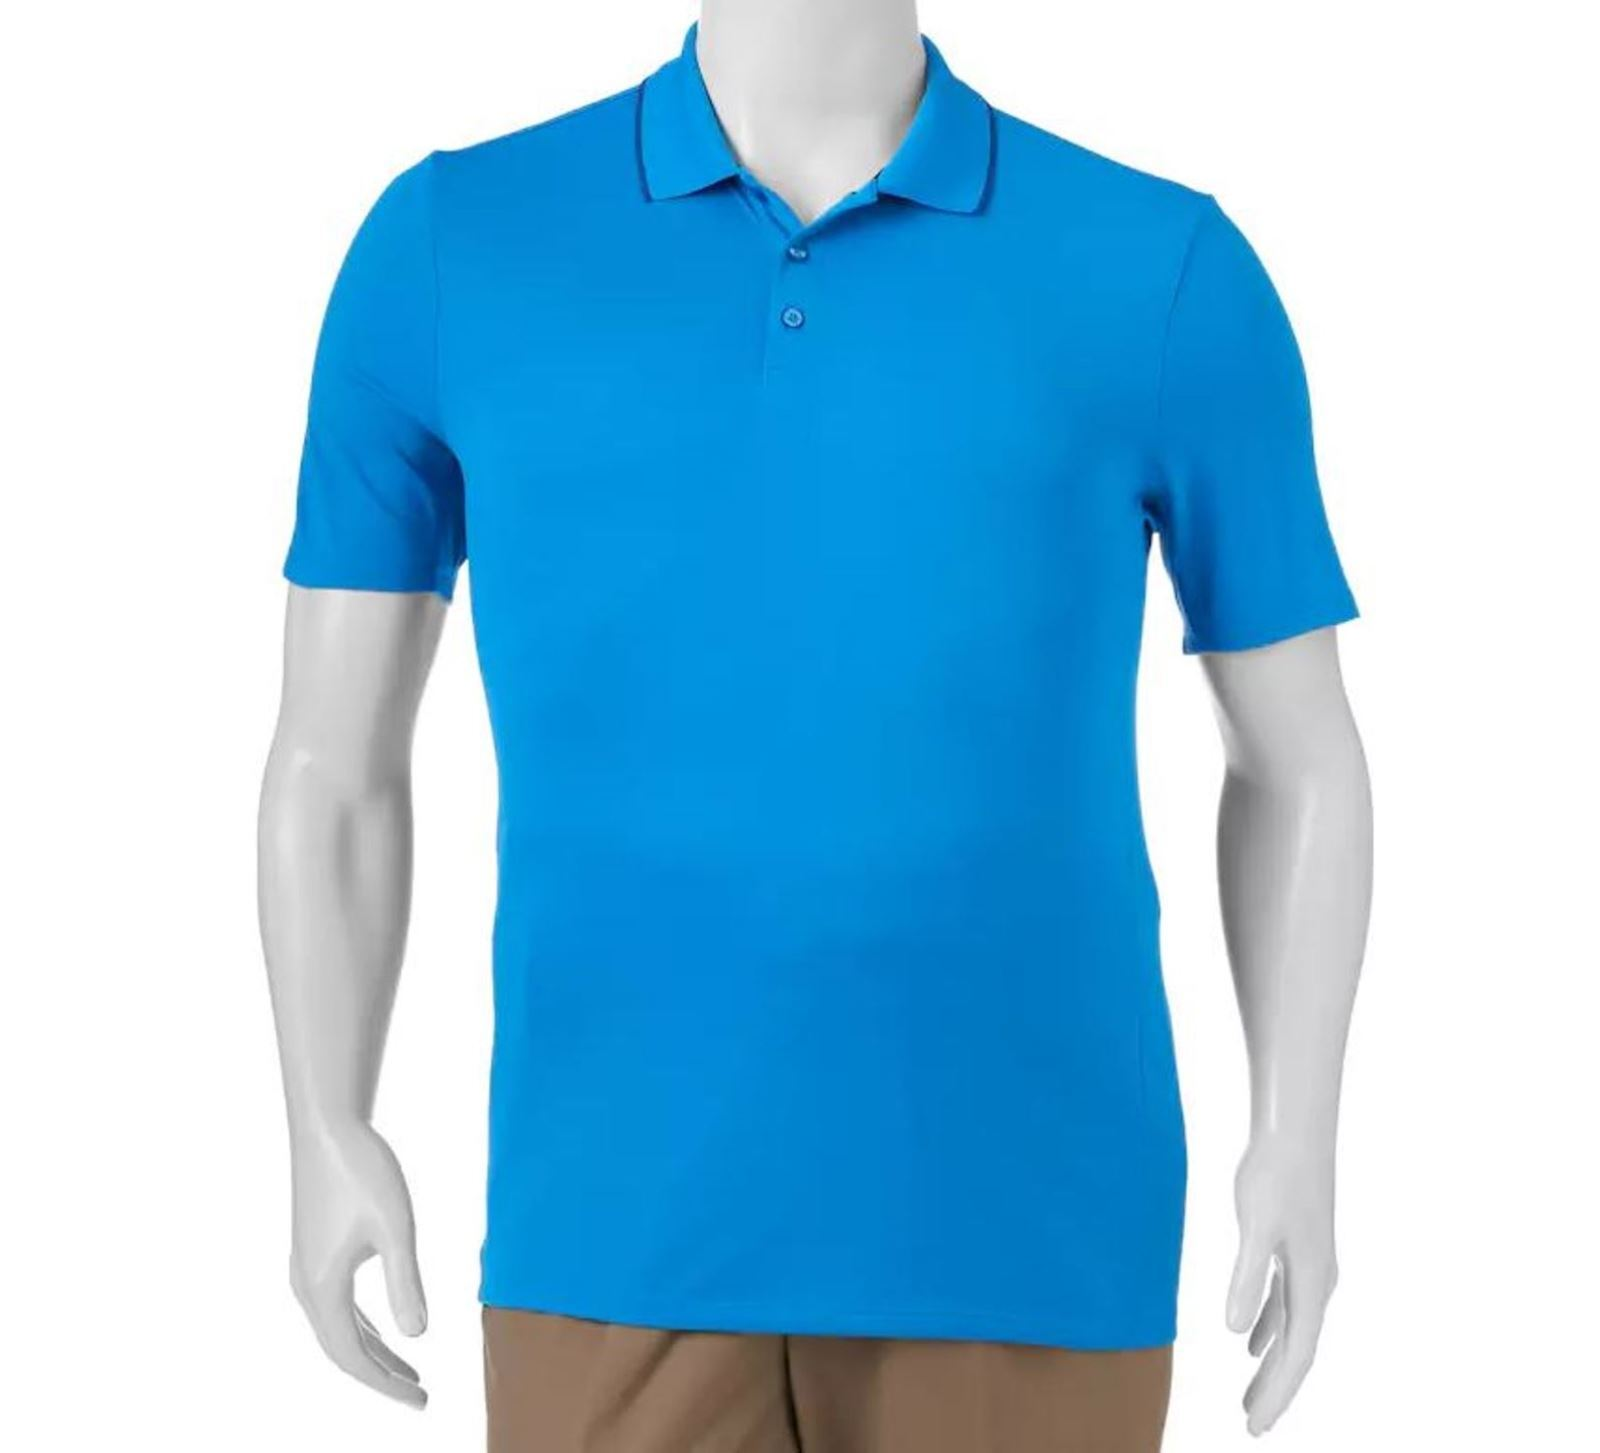 Fila Sport Golf Polo Shirt Mens Xlt Athletic Fit Blue Top X Large